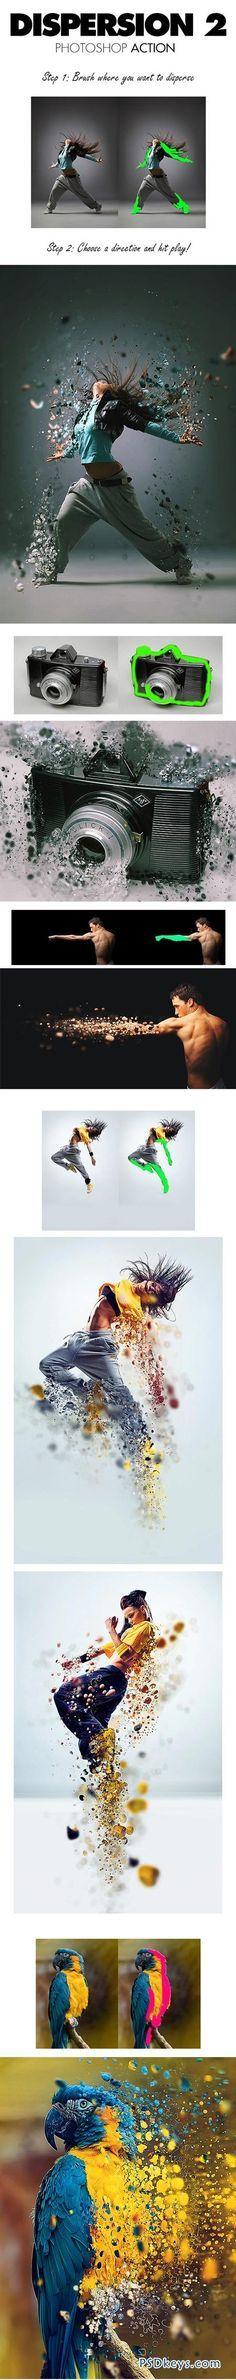 Dispersion 2 Photoshop Action #PhotoshopAction #Photoshop